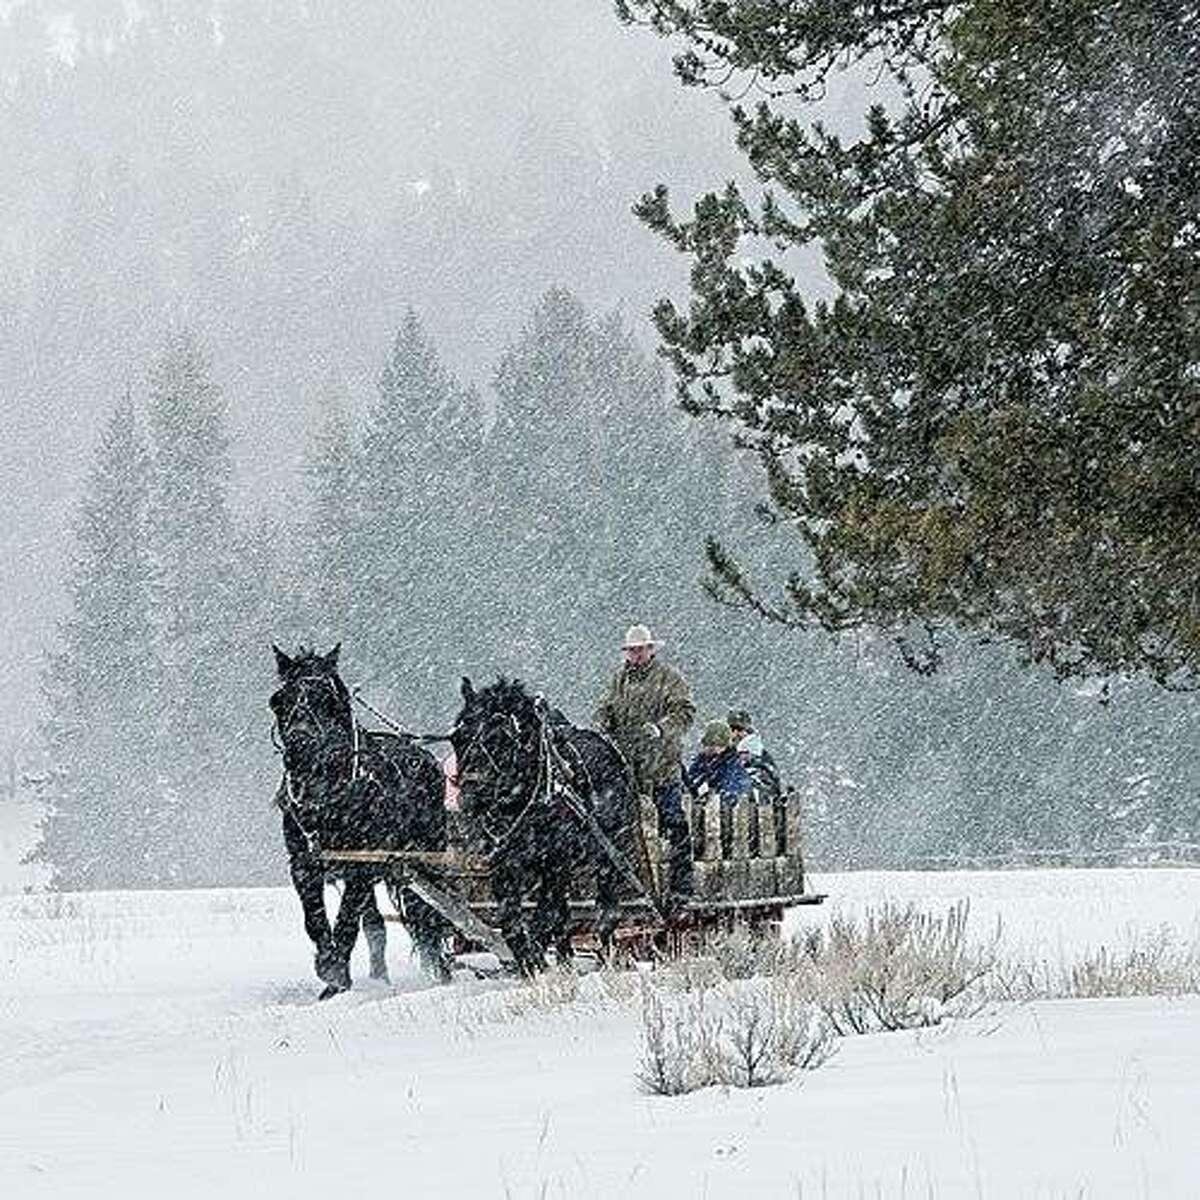 15. Montana